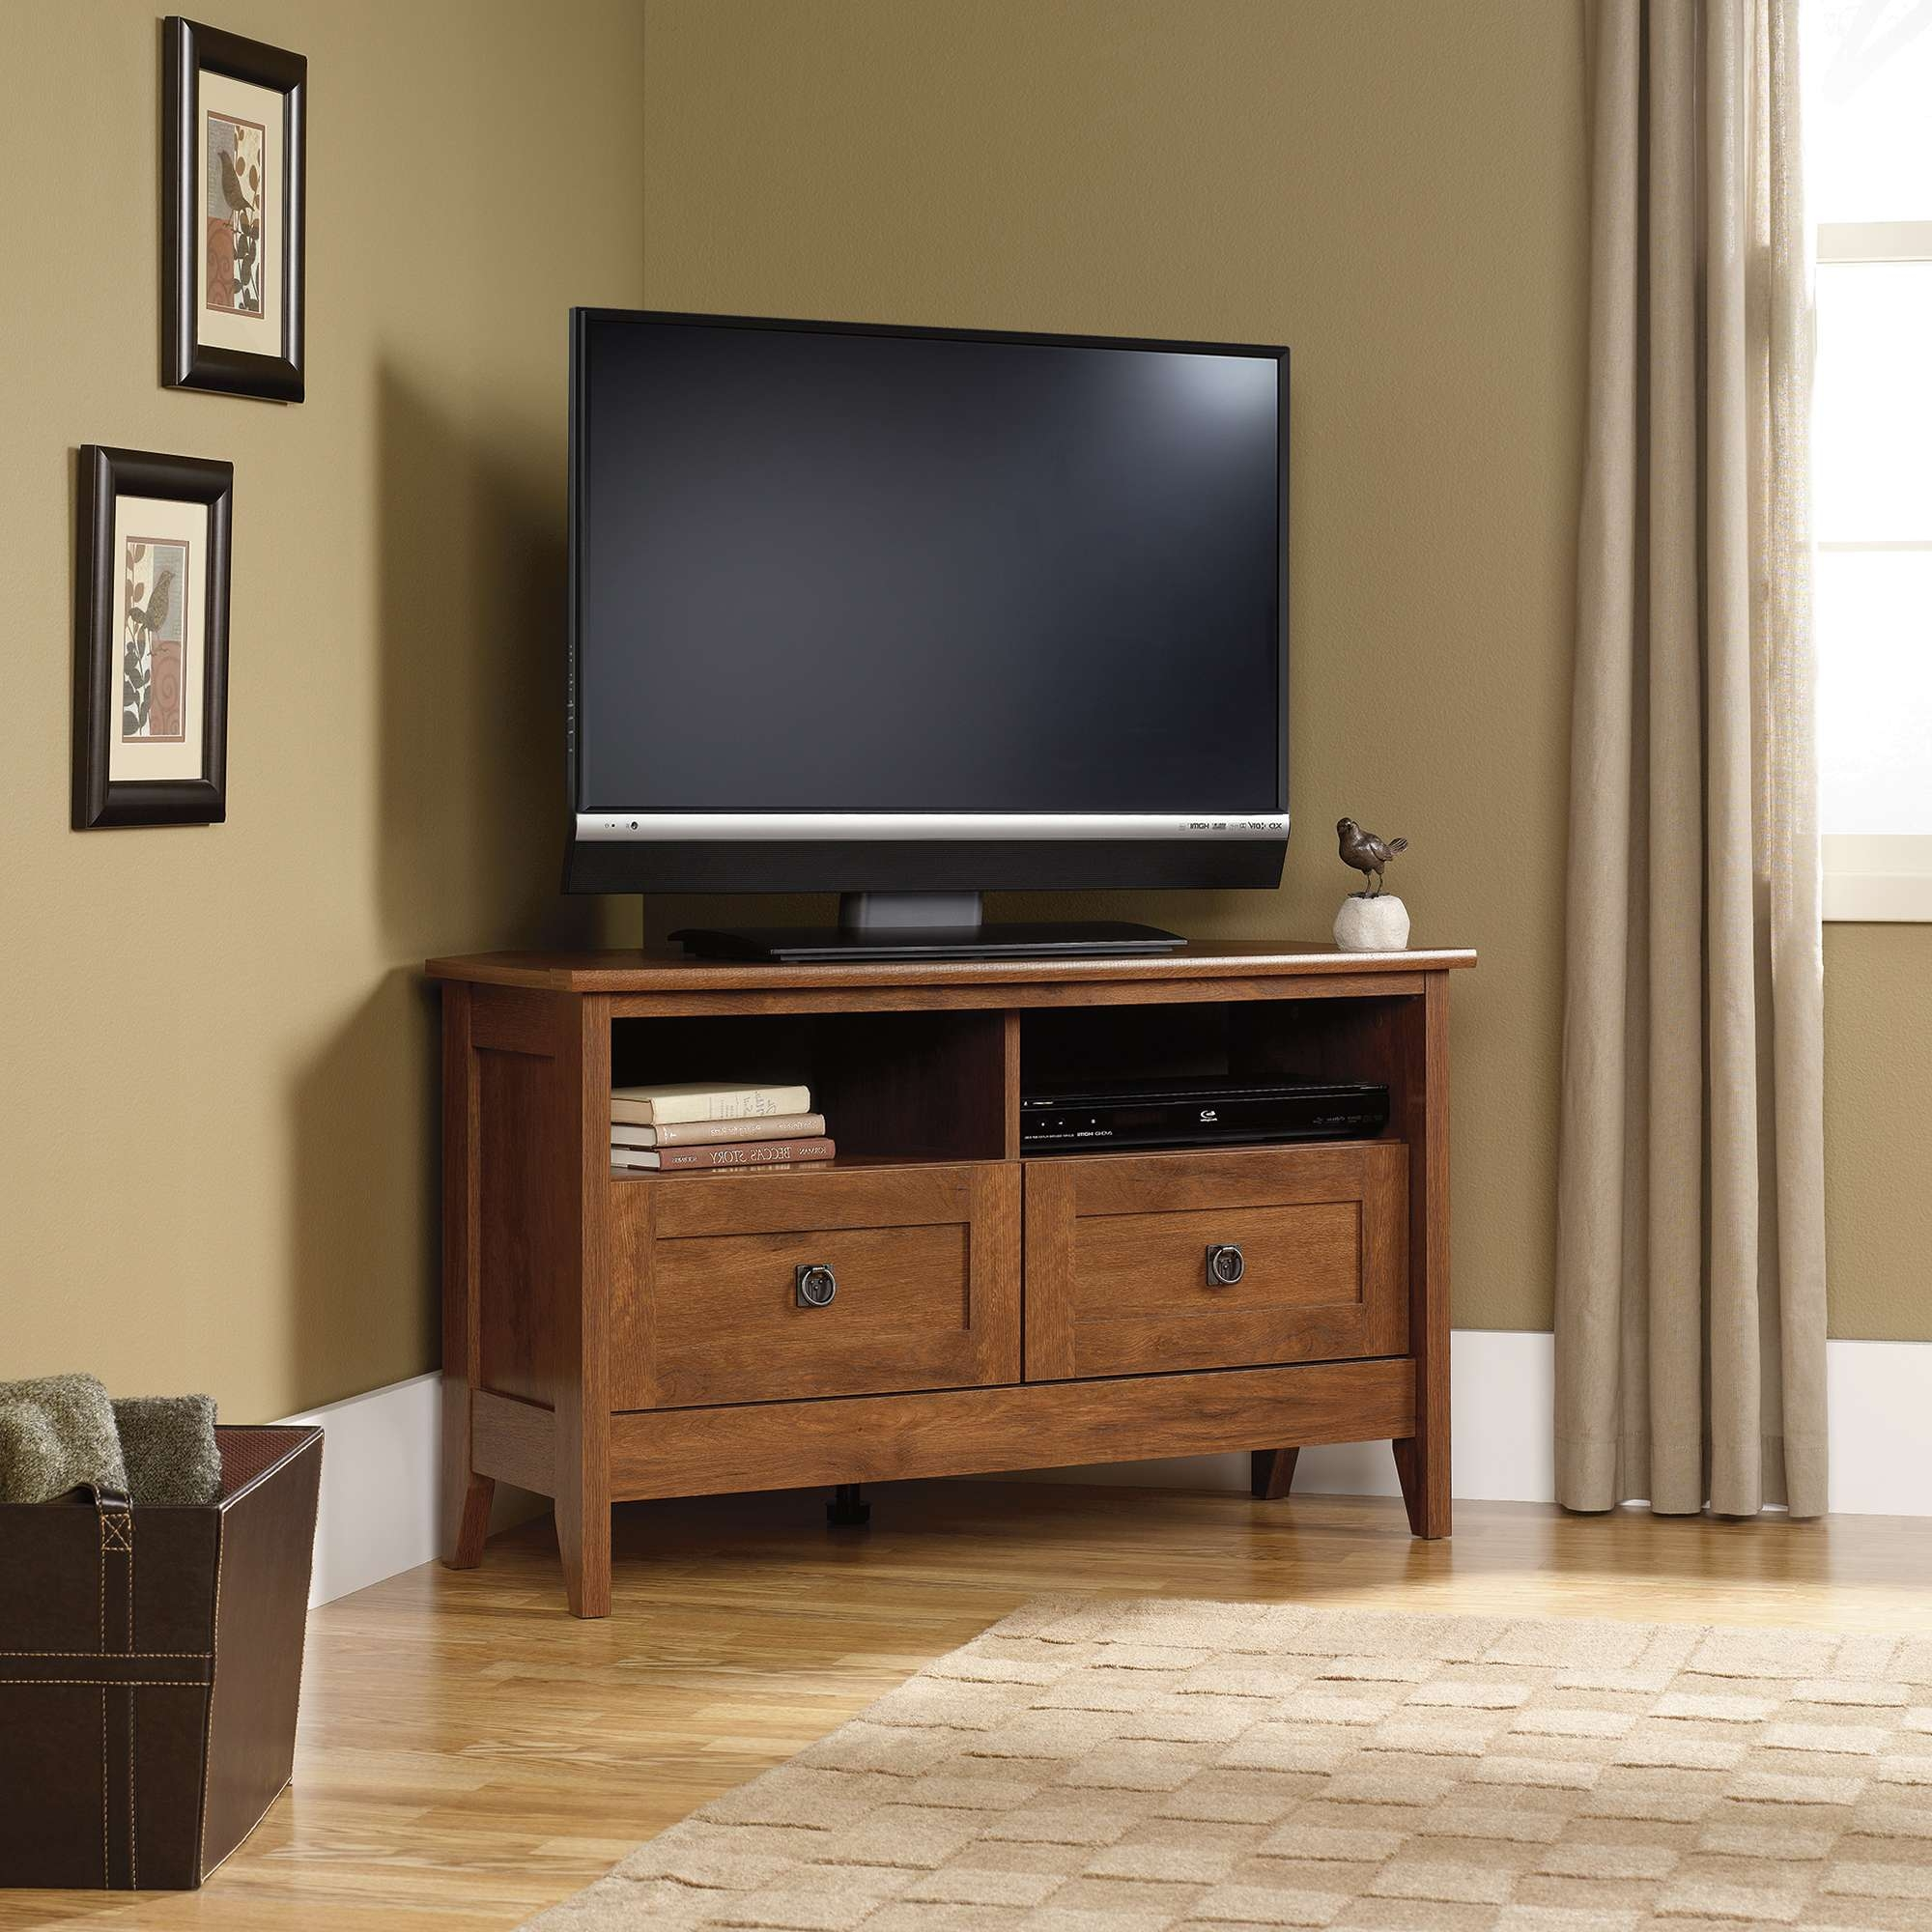 Sauder Select | Corner Tv Stand | 410627 | Sauder Regarding Cornet Tv Stands (View 14 of 15)